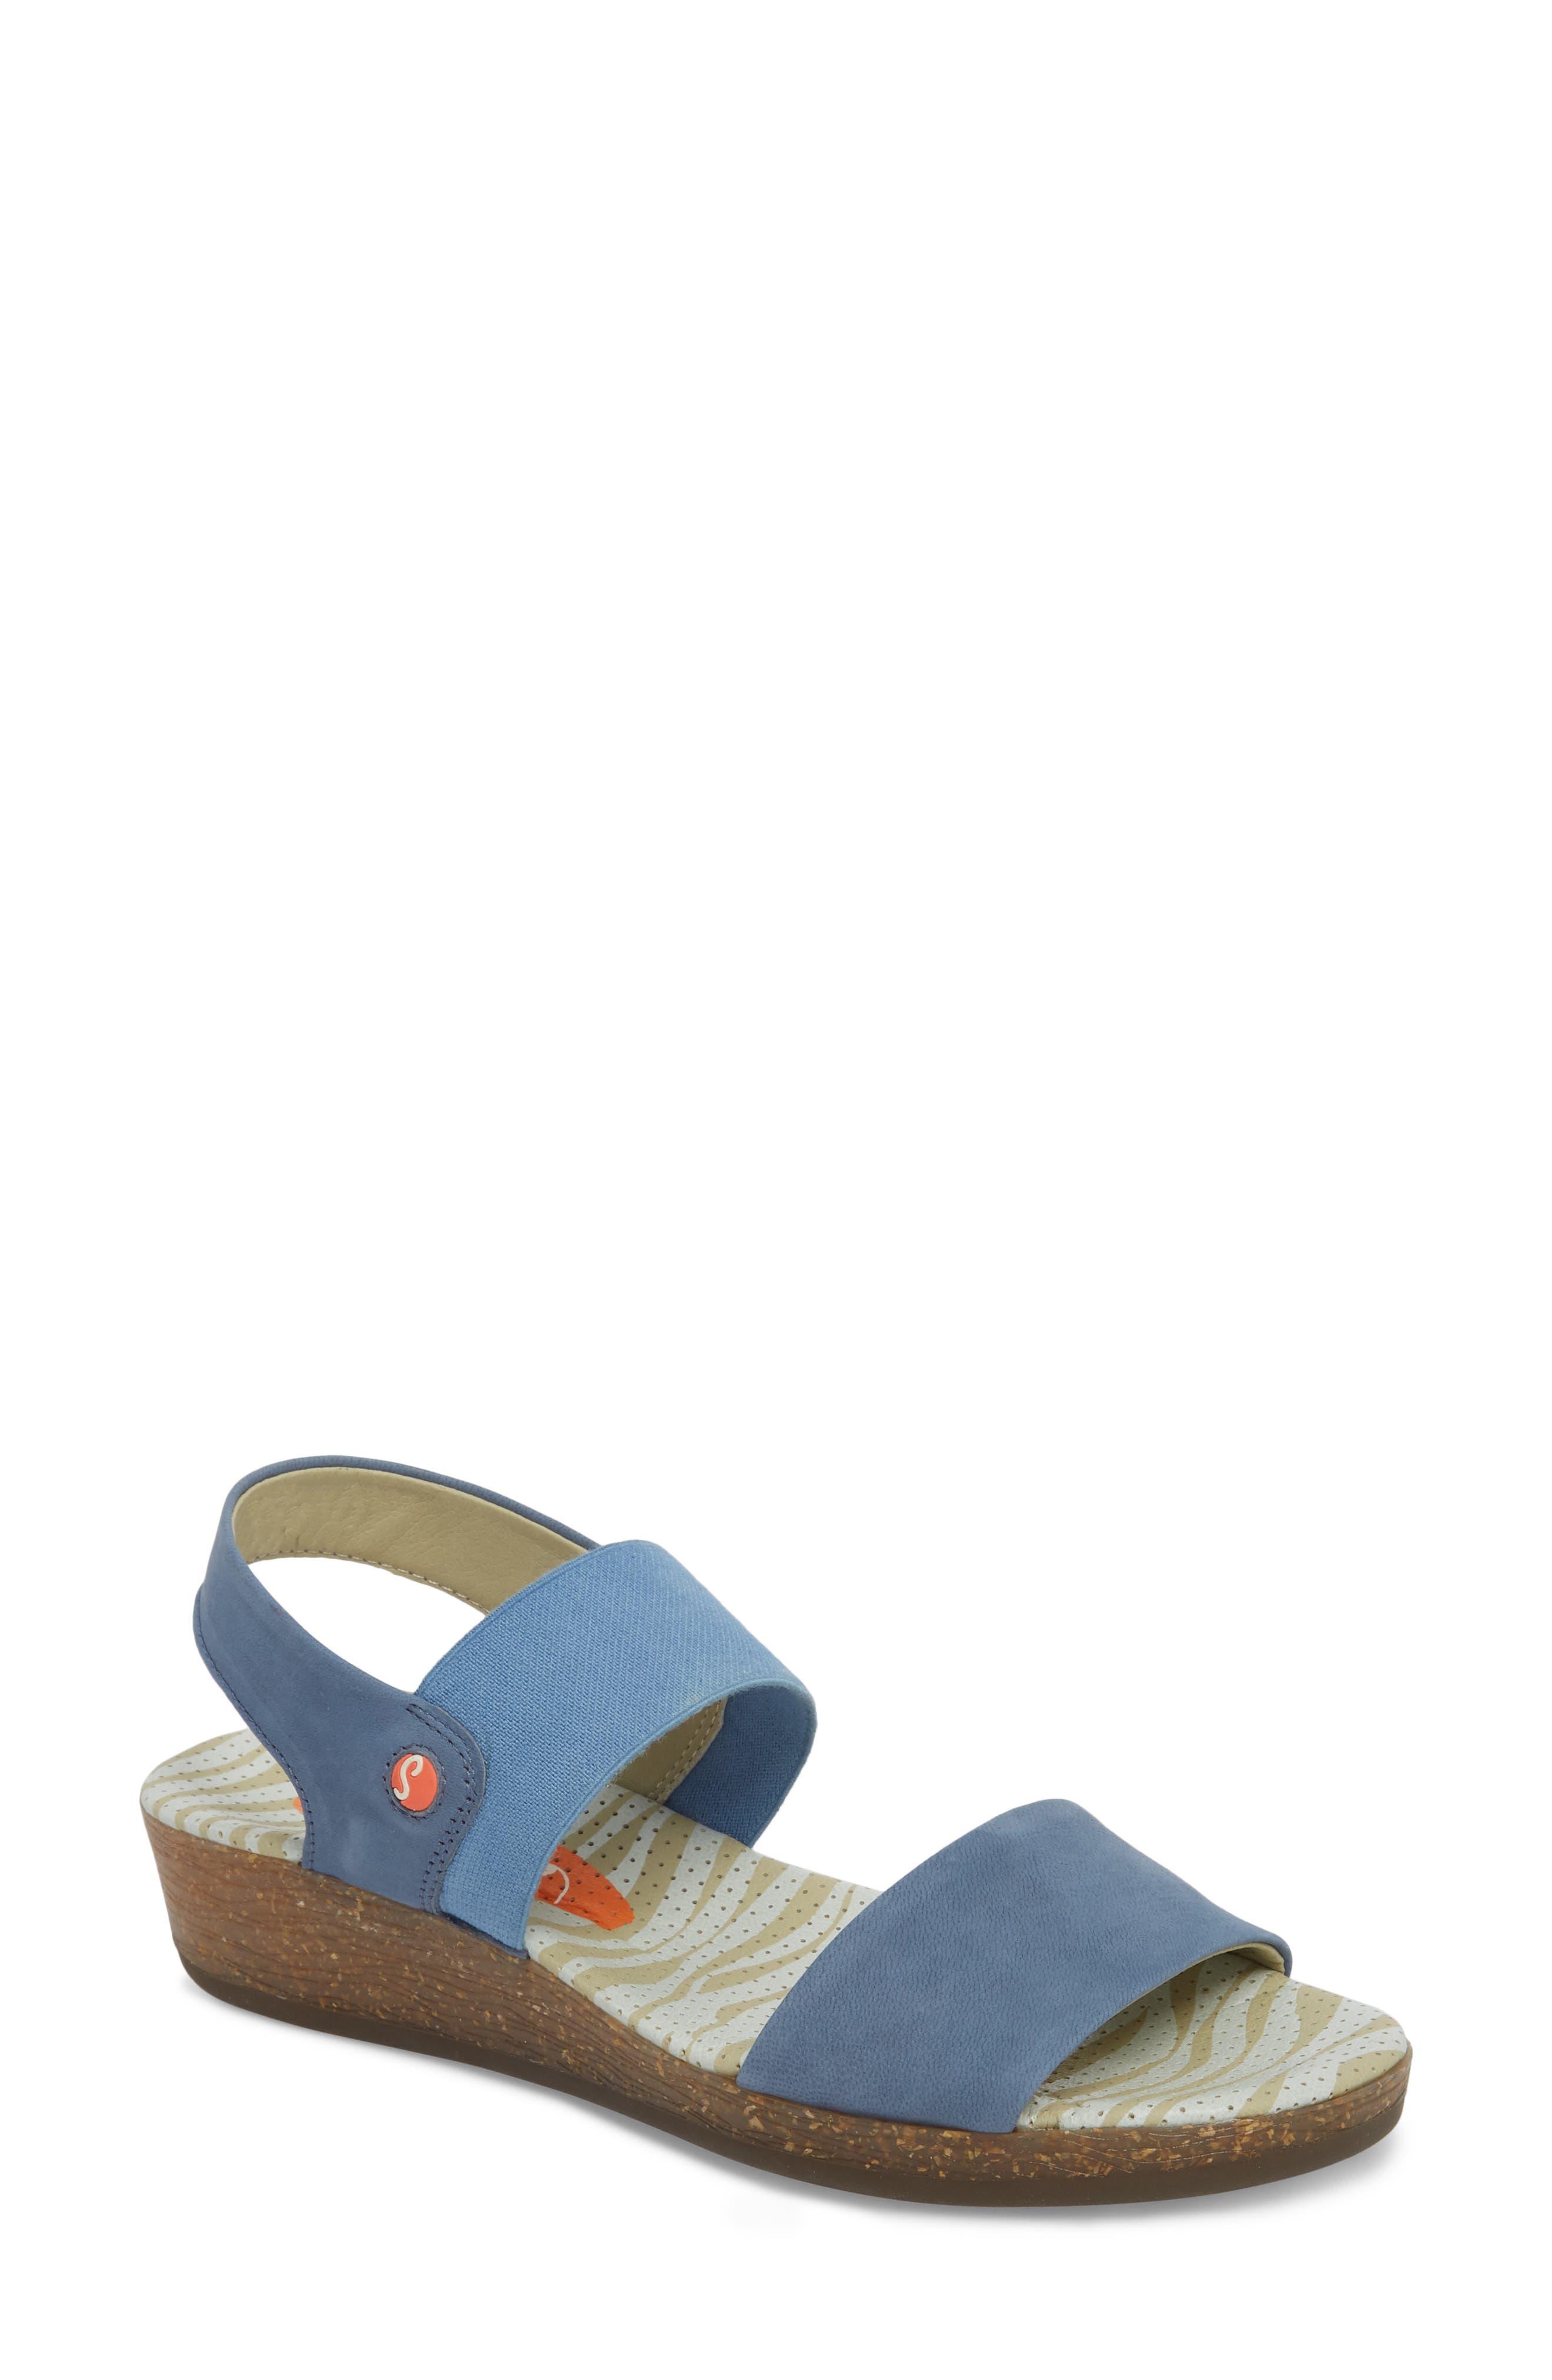 Softinos By Fly London Alp425Sof Sandal - Blue